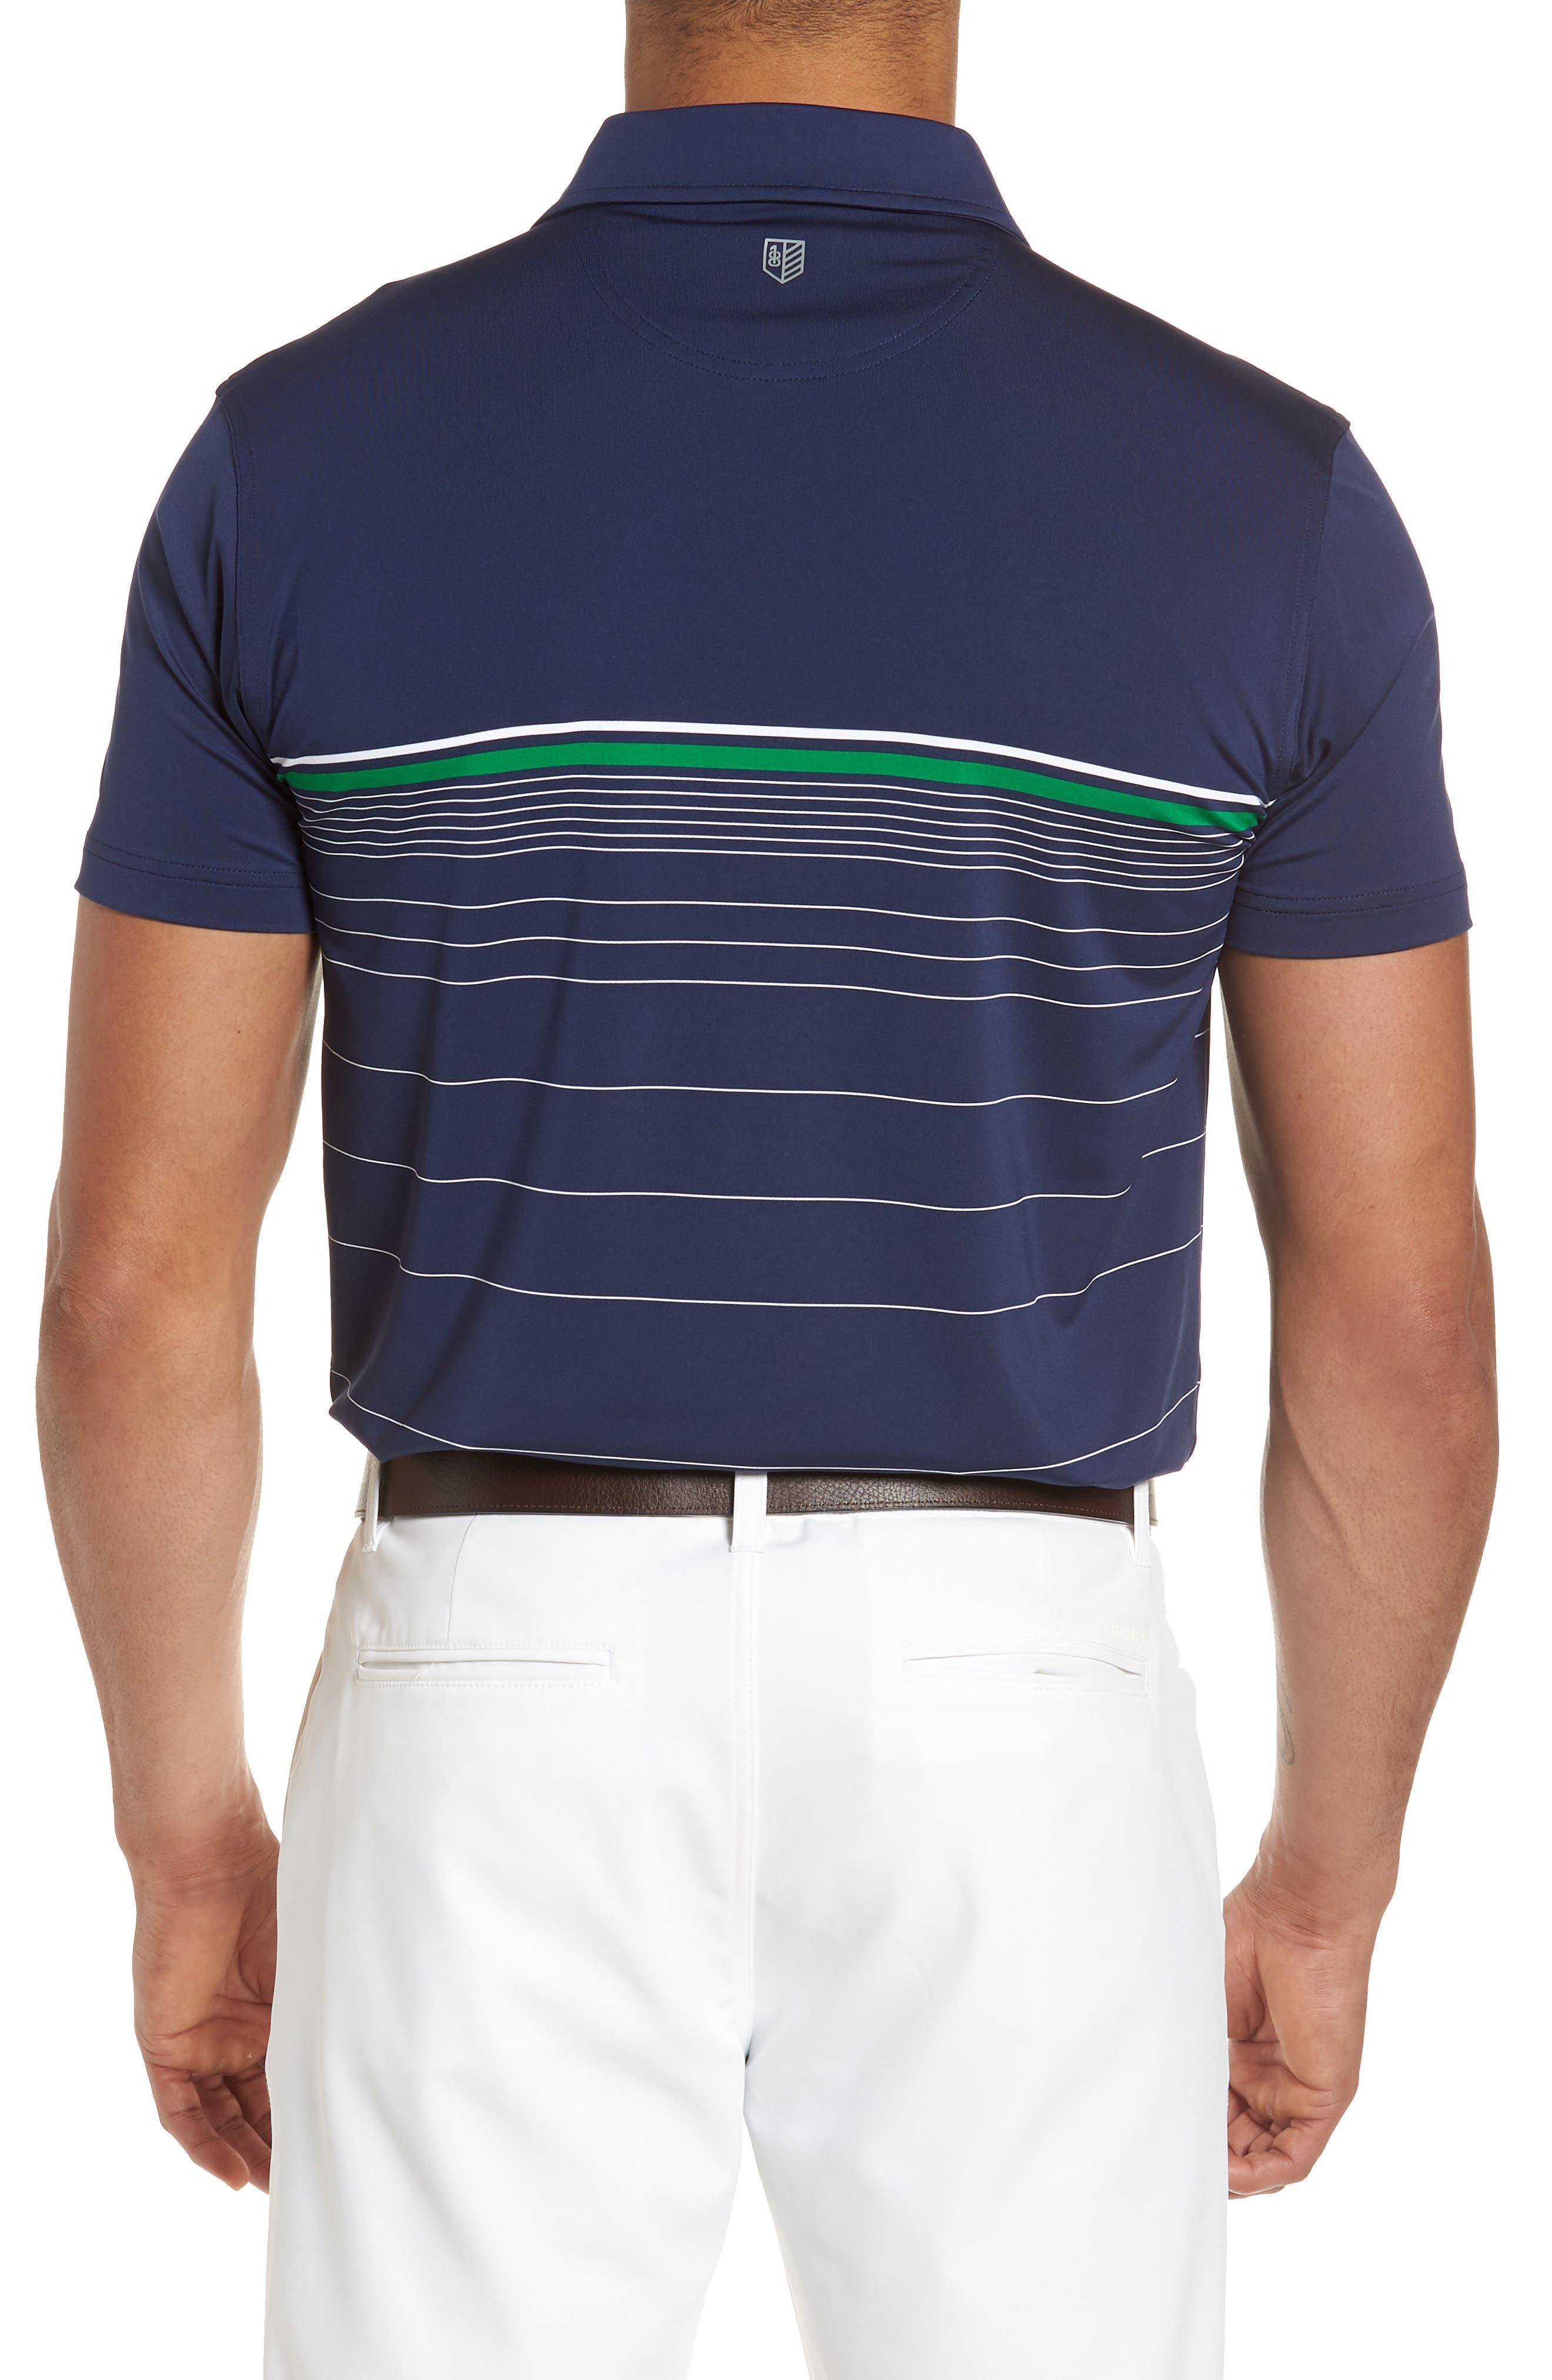 R18 Tech Skill Stripe Polo,                             Alternate thumbnail 2, color,                             Navy